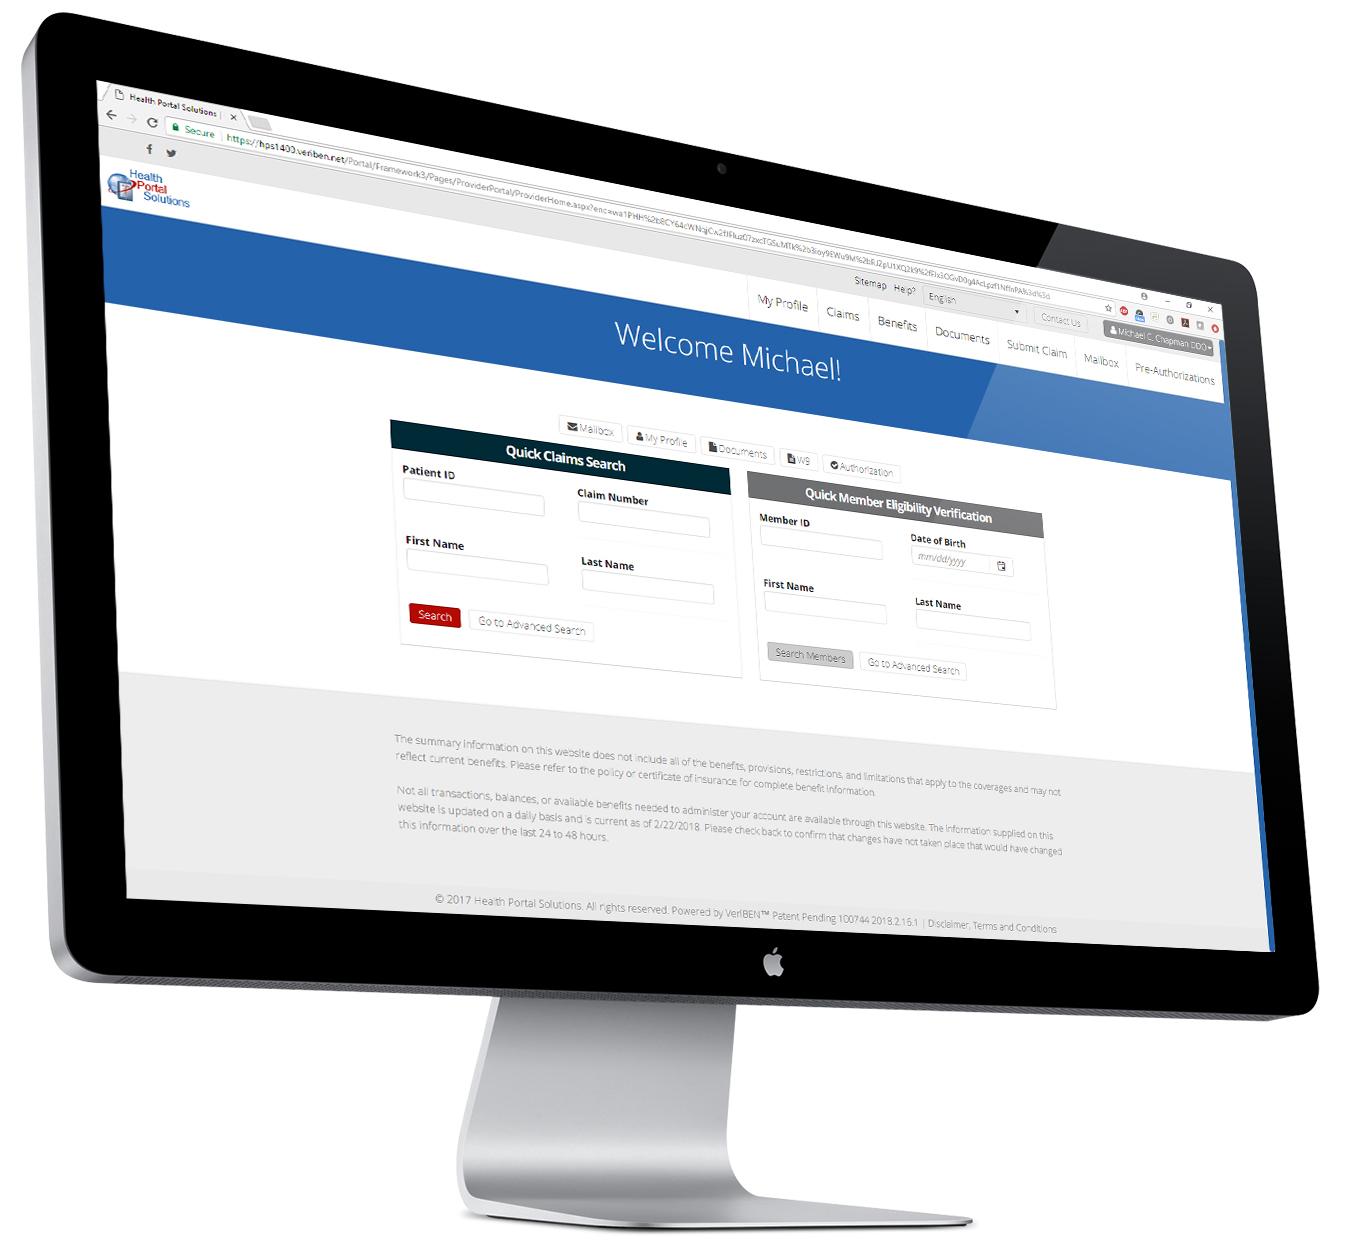 desktop view of healthcare provider portal